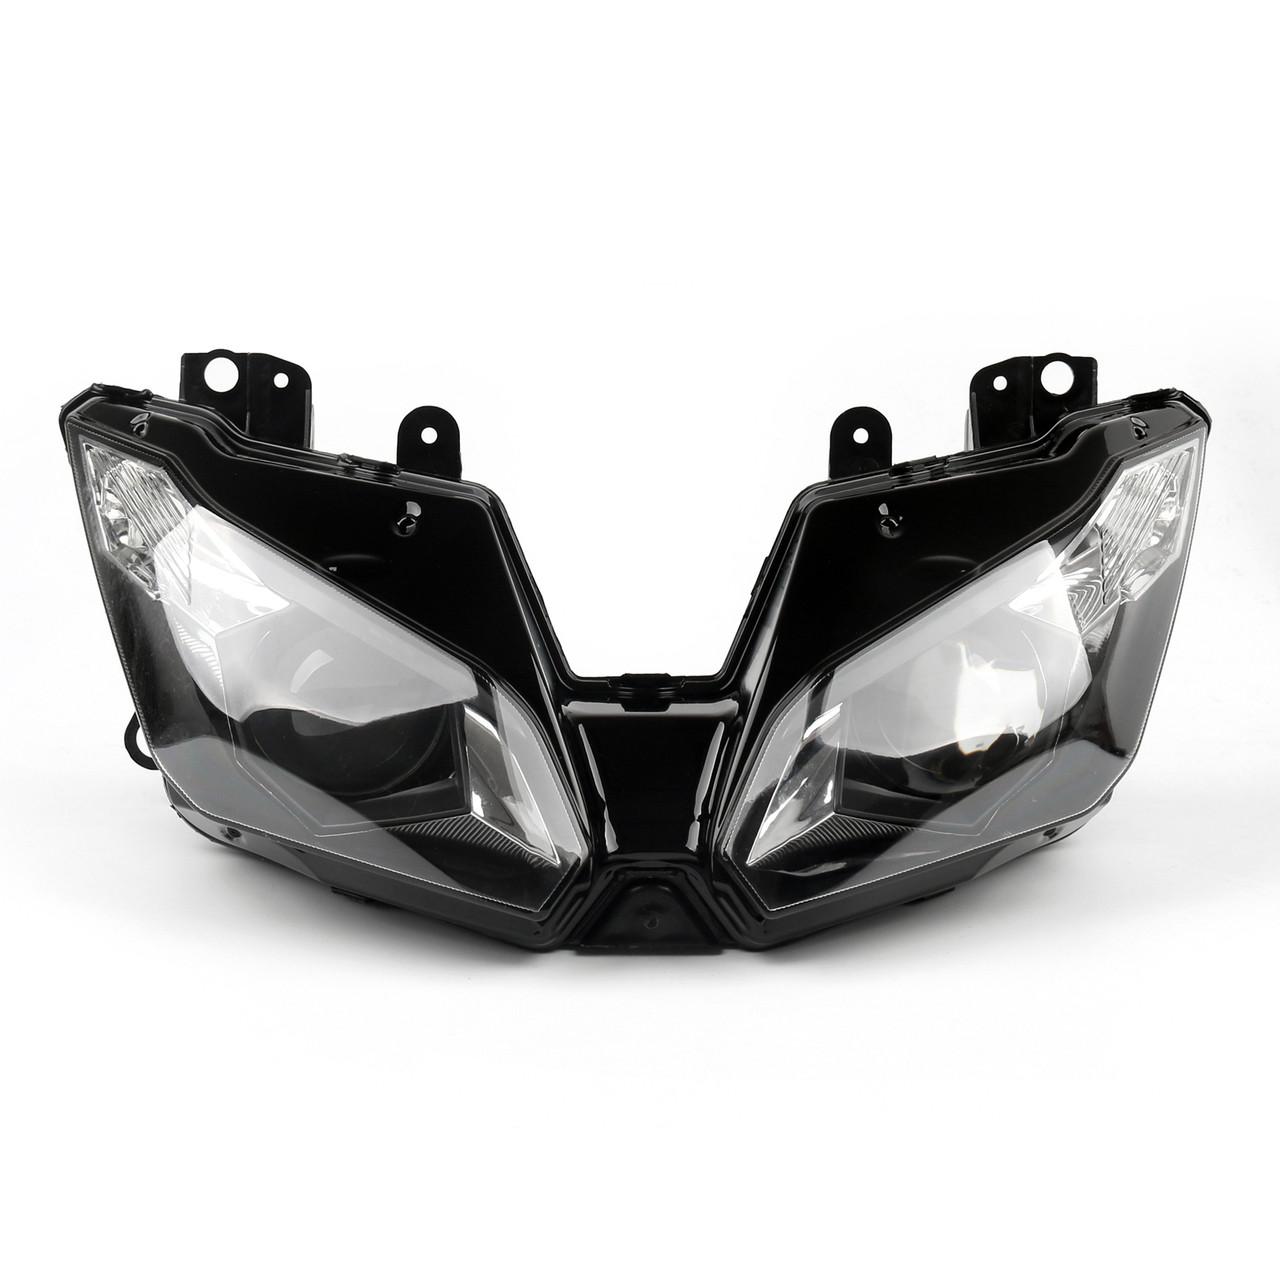 Headlight Lens Cover Shield For 05-06 Kawasaki Ninja ZX6R ZX636 2005 2006 Clear